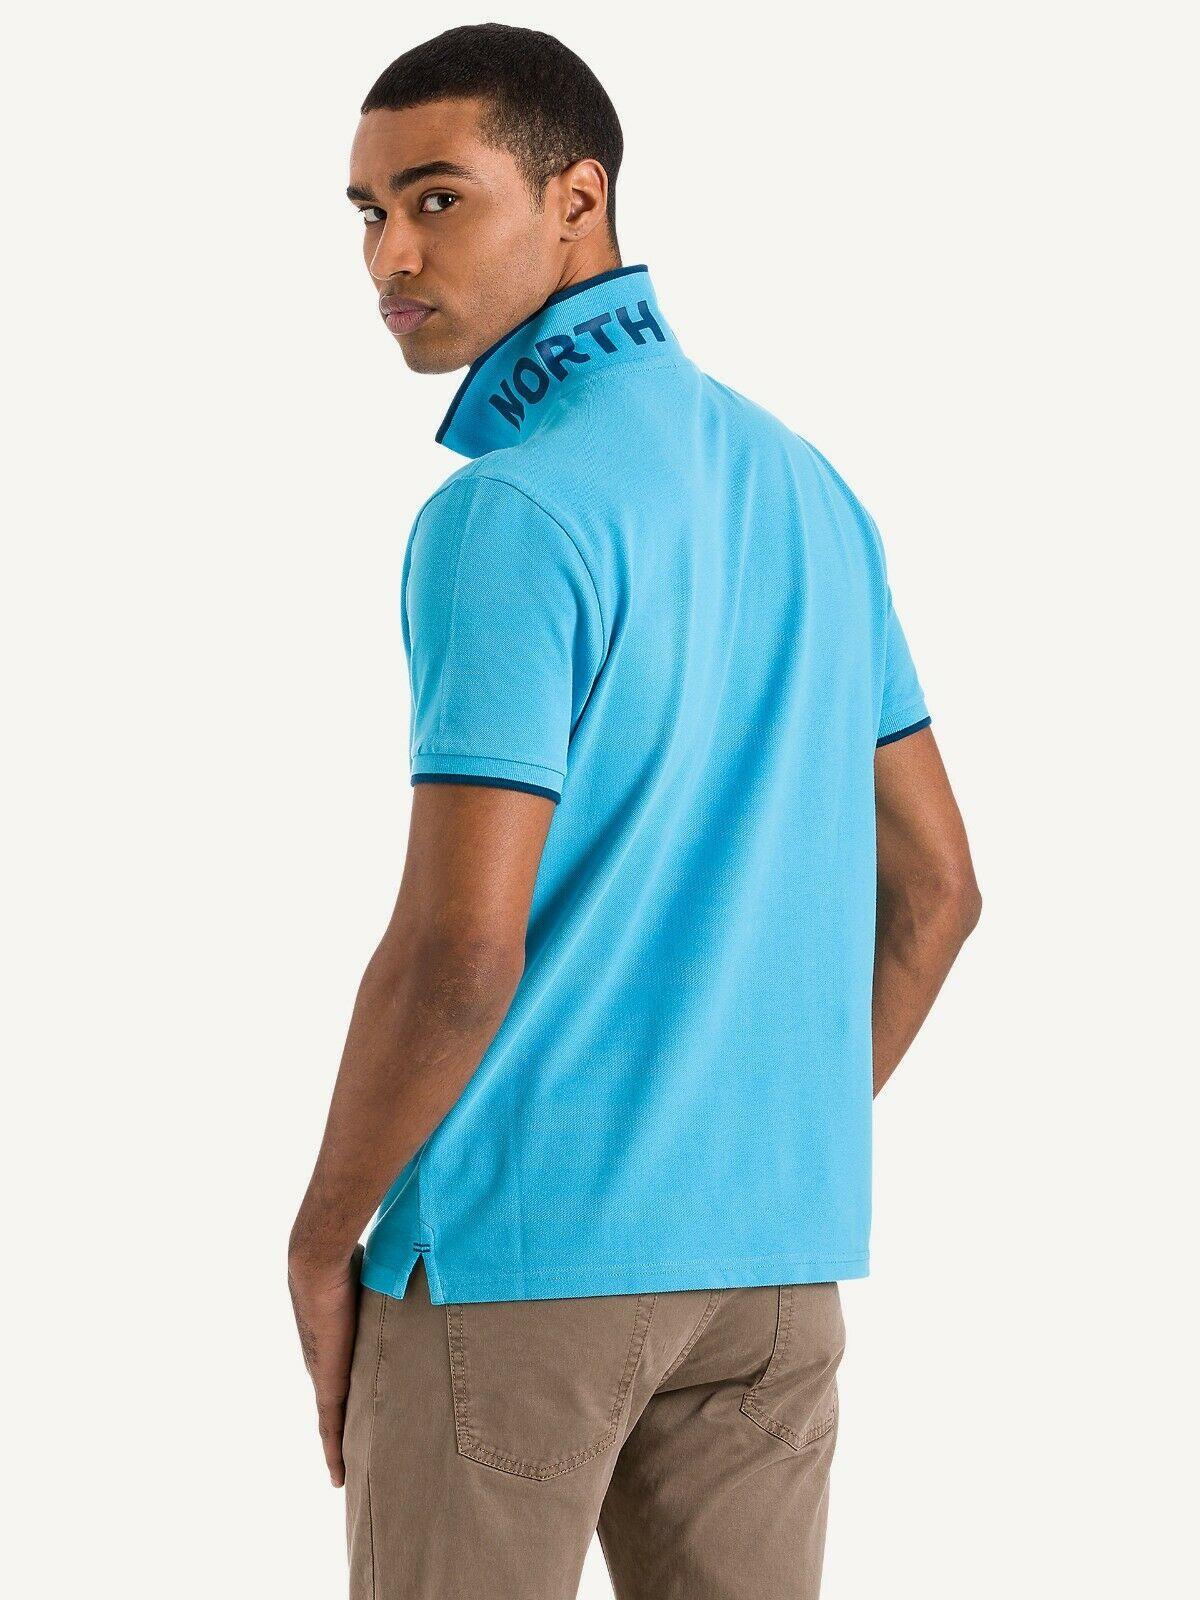 NORTH-SAILS-Mens-Legacy-Heritage-Short-Sleeve-Polo-Shirt-SALE-RRP-50 thumbnail 74